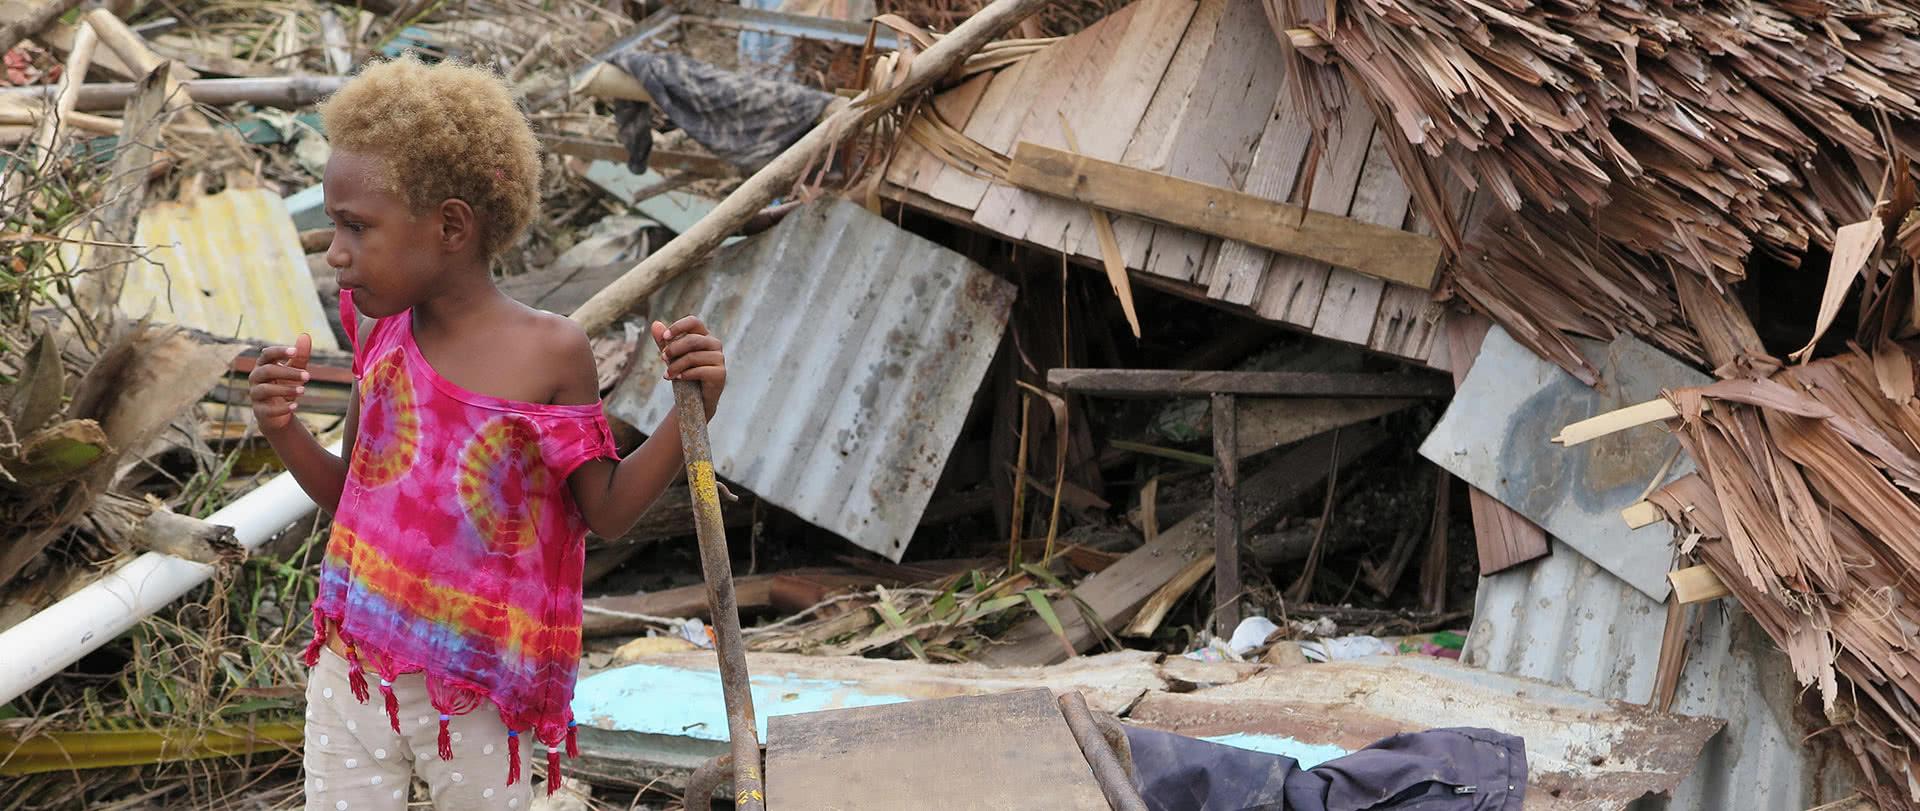 shelter-appeal-1920-featured-boy-debris-vanuatu